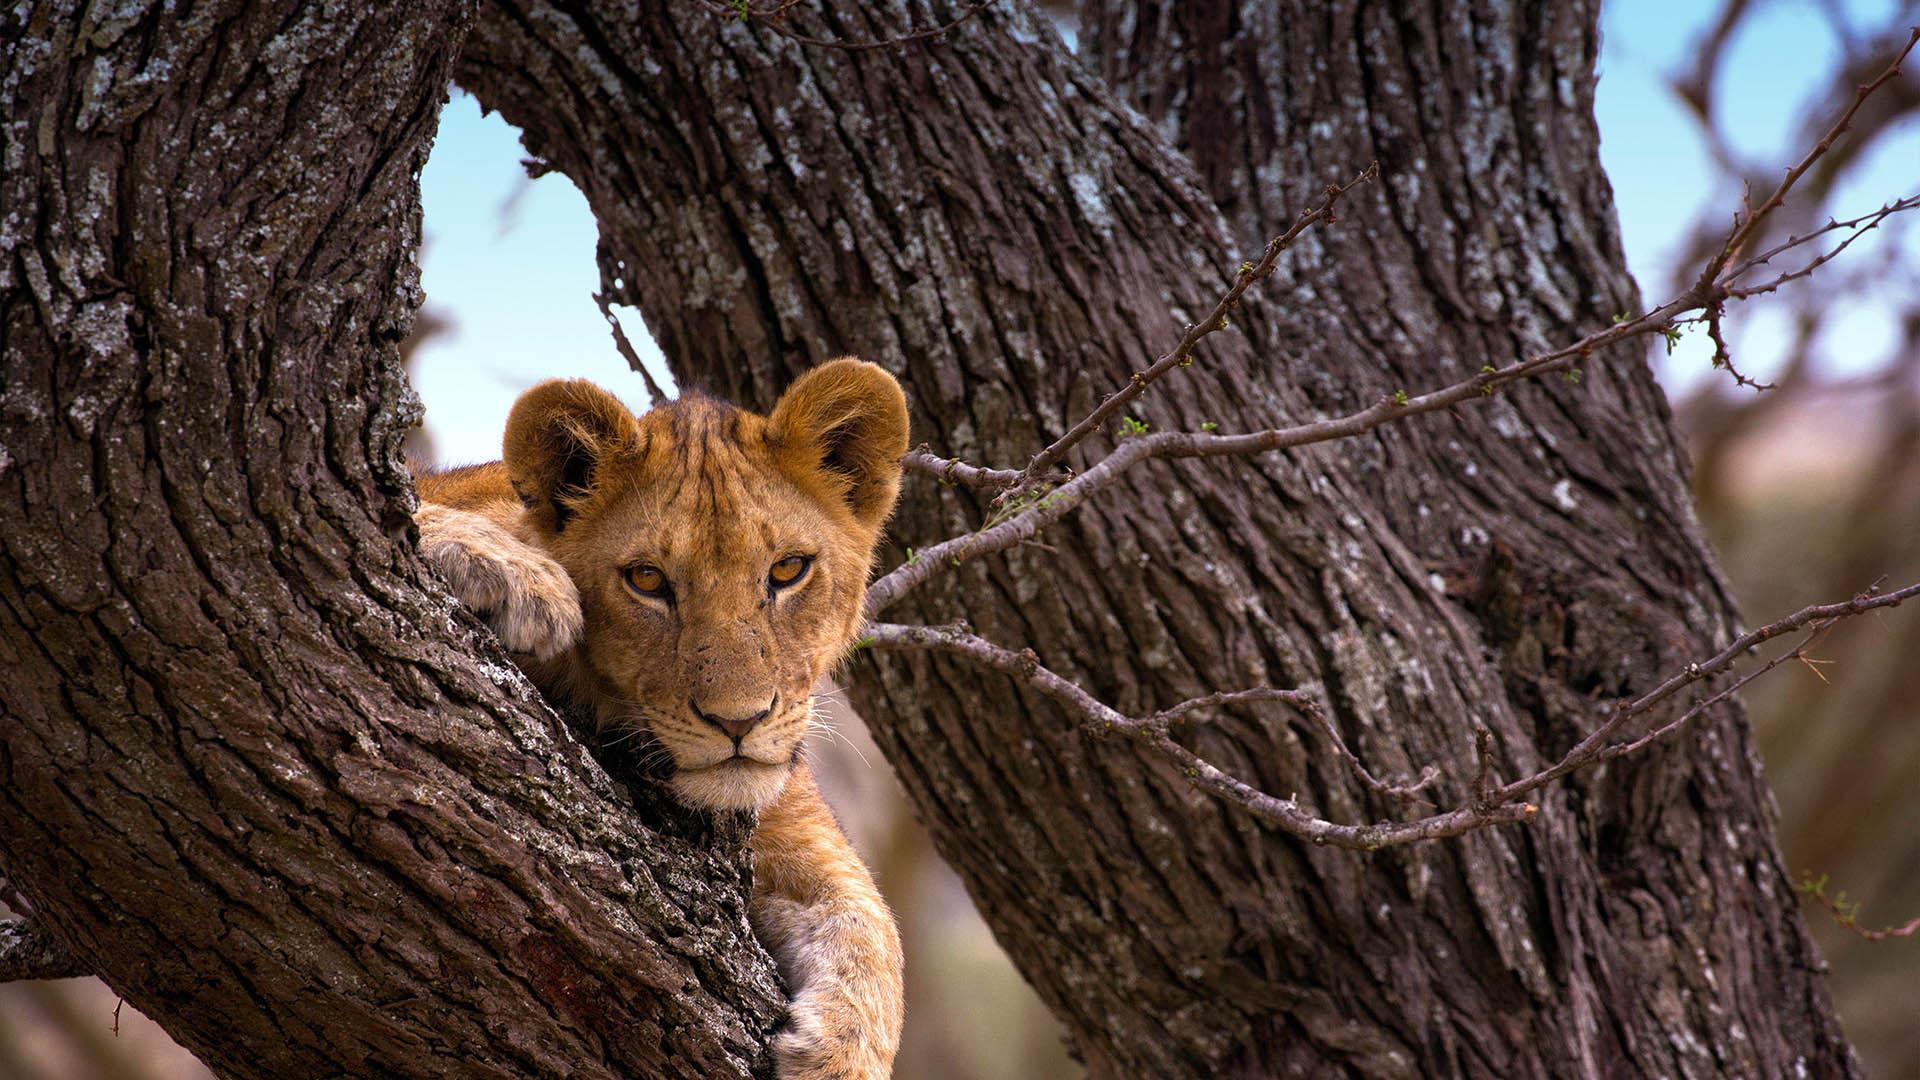 enquire-now-nasikia-camps-game-drives-tours-tanzania-safaris-africa